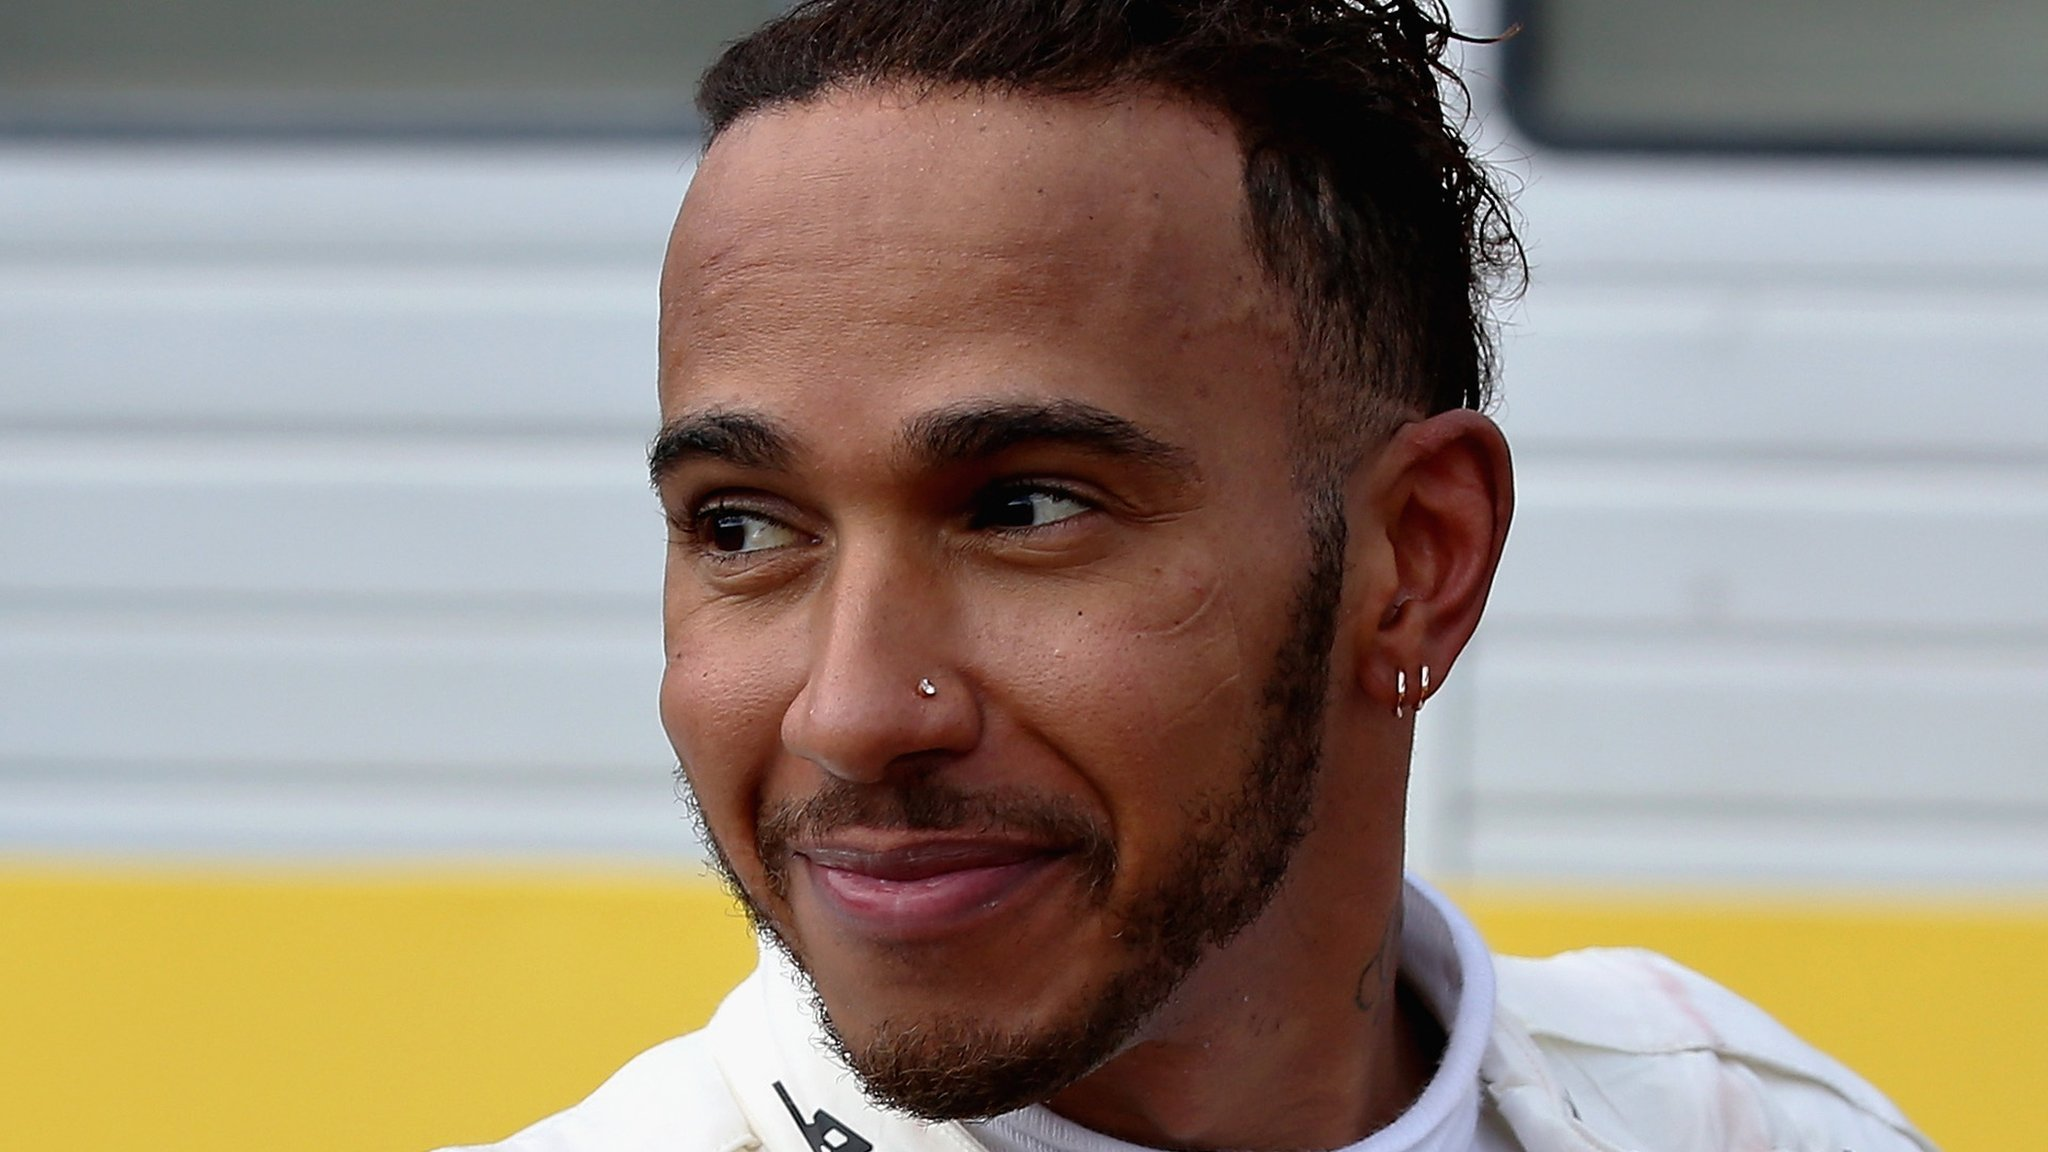 Lewis Hamilton is once again benefitting from Sebastian Vettel marginal errors